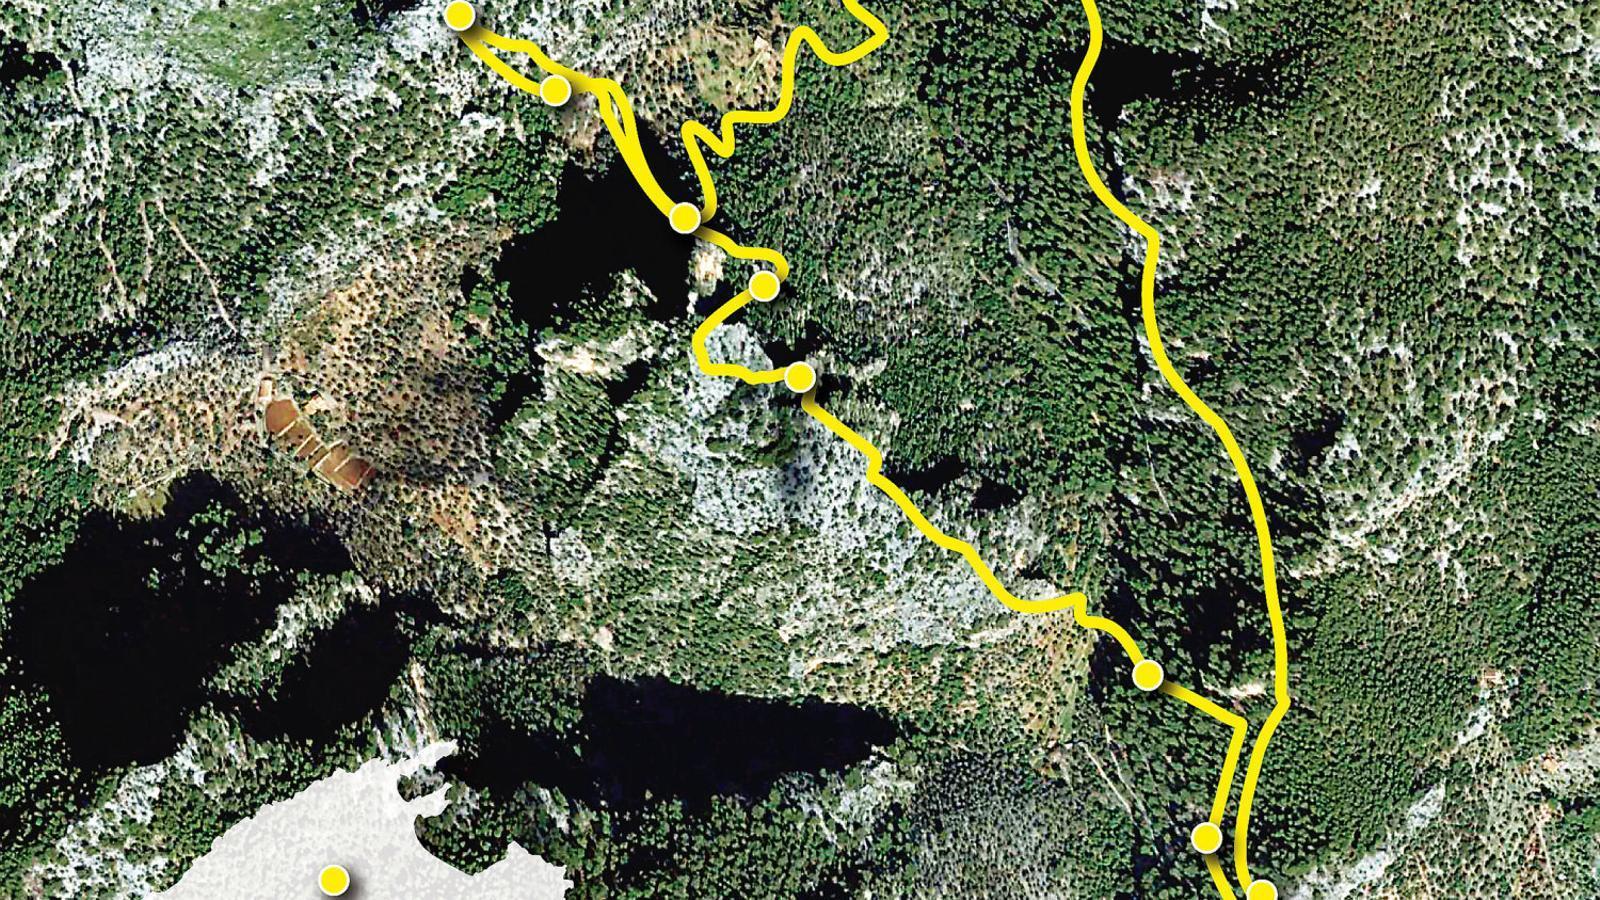 El puig de n'Escuder   i el pas de la rota d'en Clapat